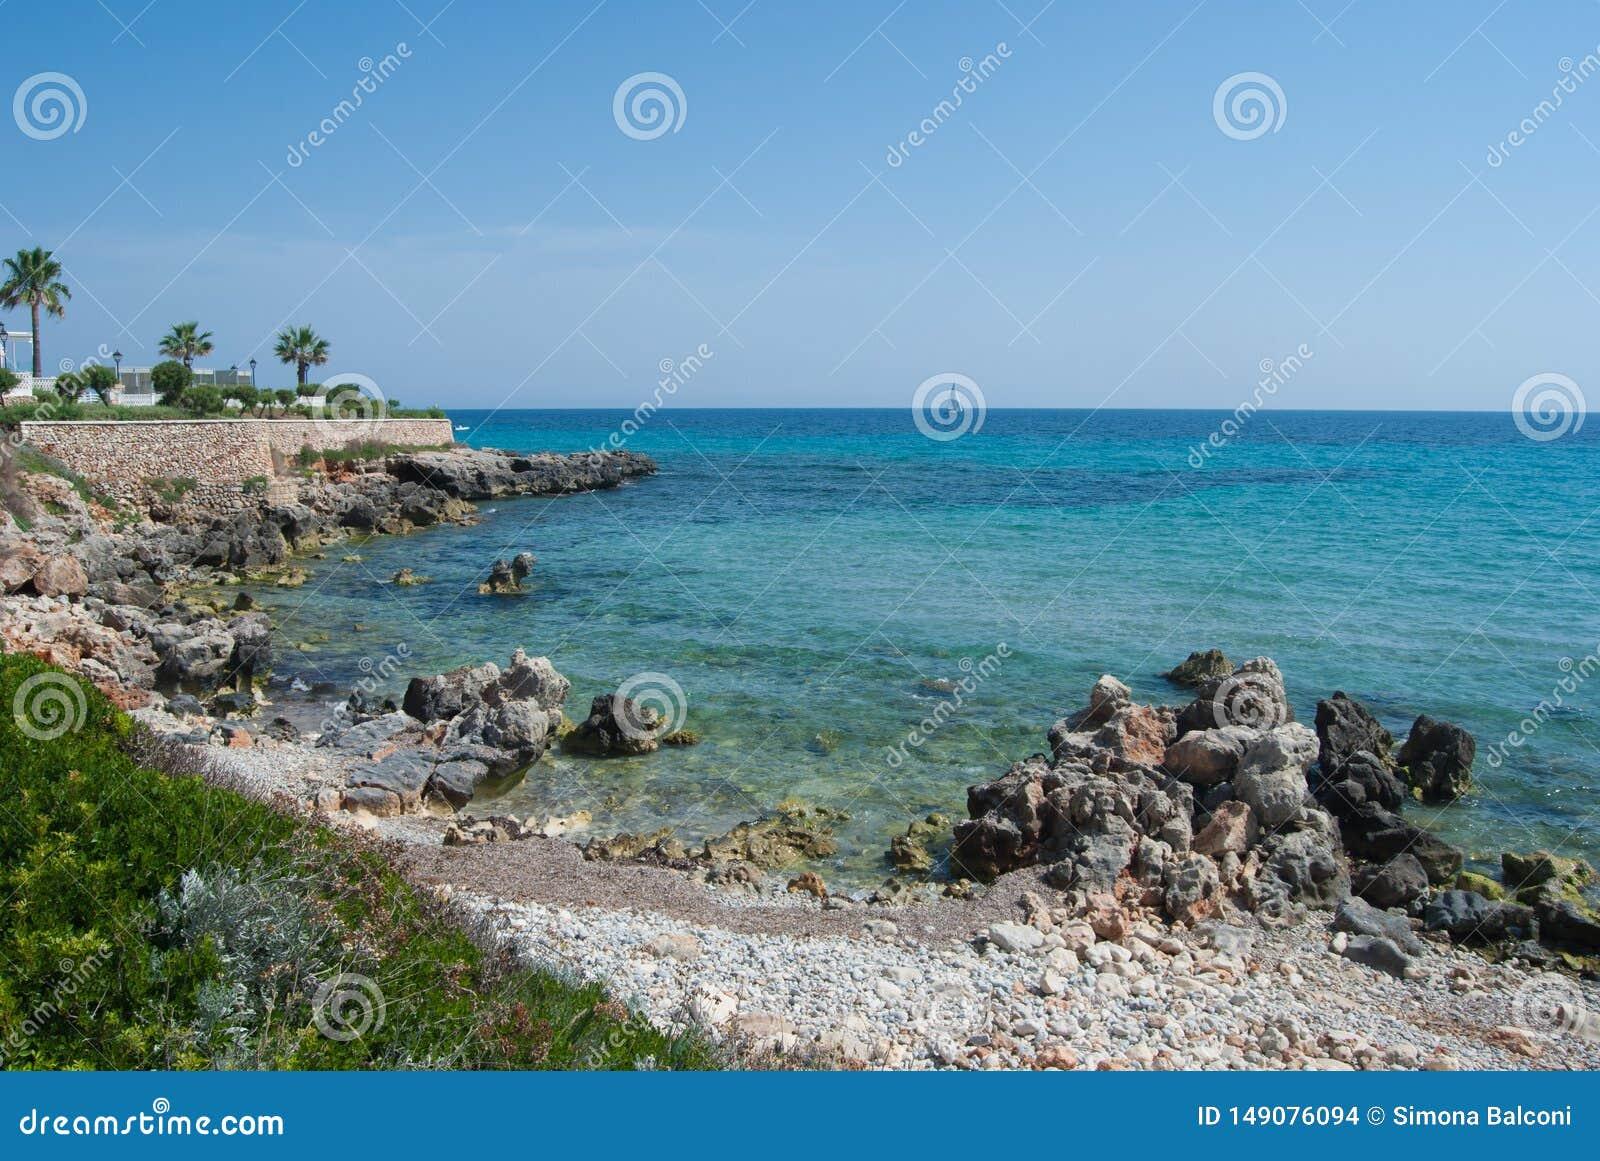 Touristic зона Minorca маленький остров Испании